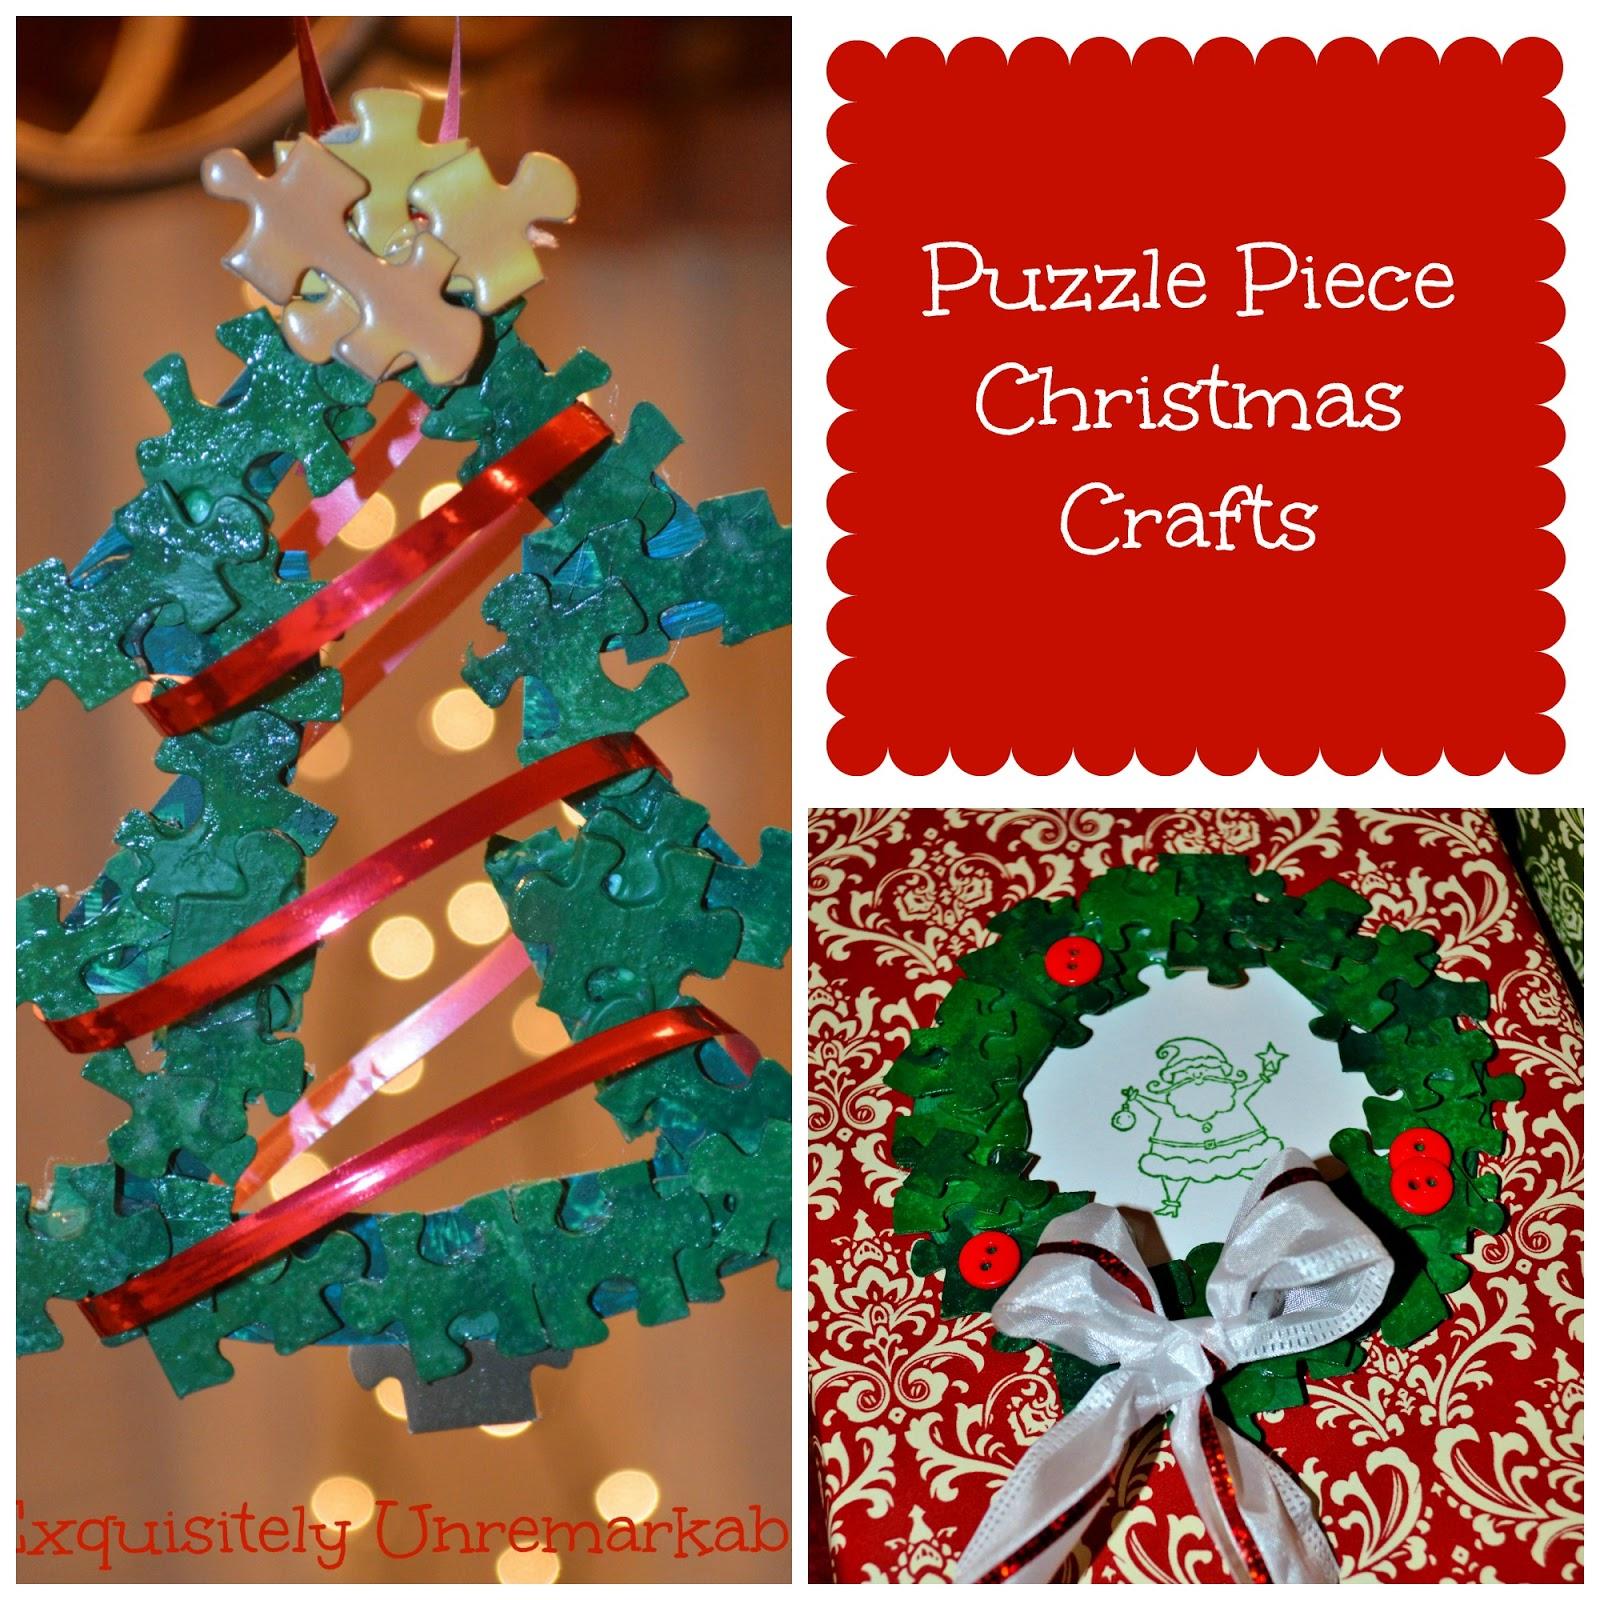 Superior Christmas Craft Ideas 2013 Part - 8: December 19, 2013